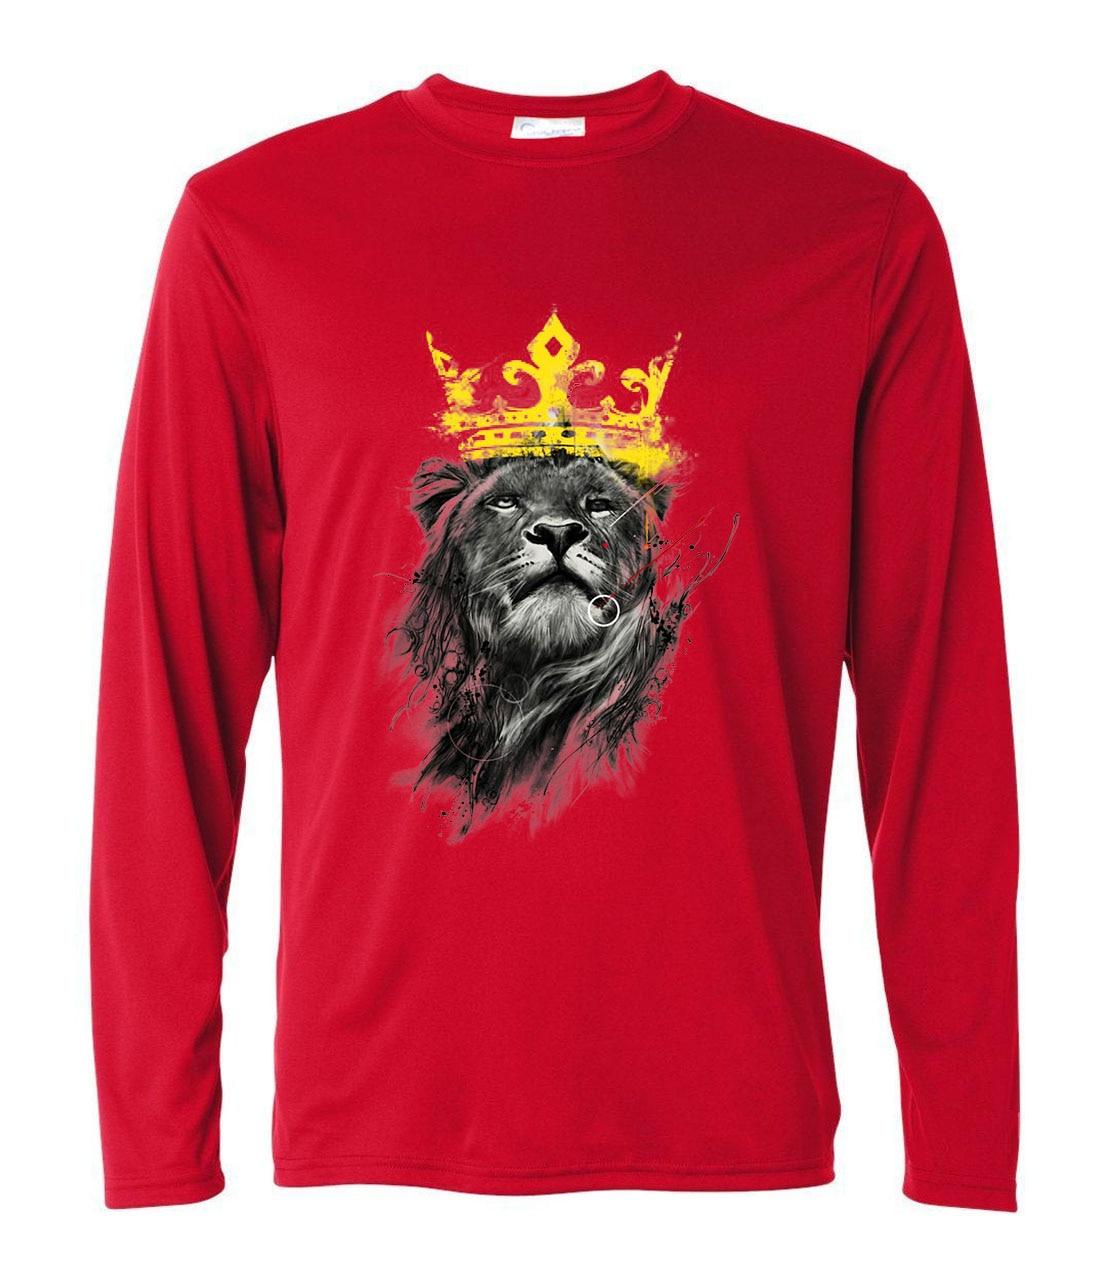 harajuku fitness men's casual t-shirt 2019 long sleeve king of lion t shirts for man spring summer harajuku tee shirt homme